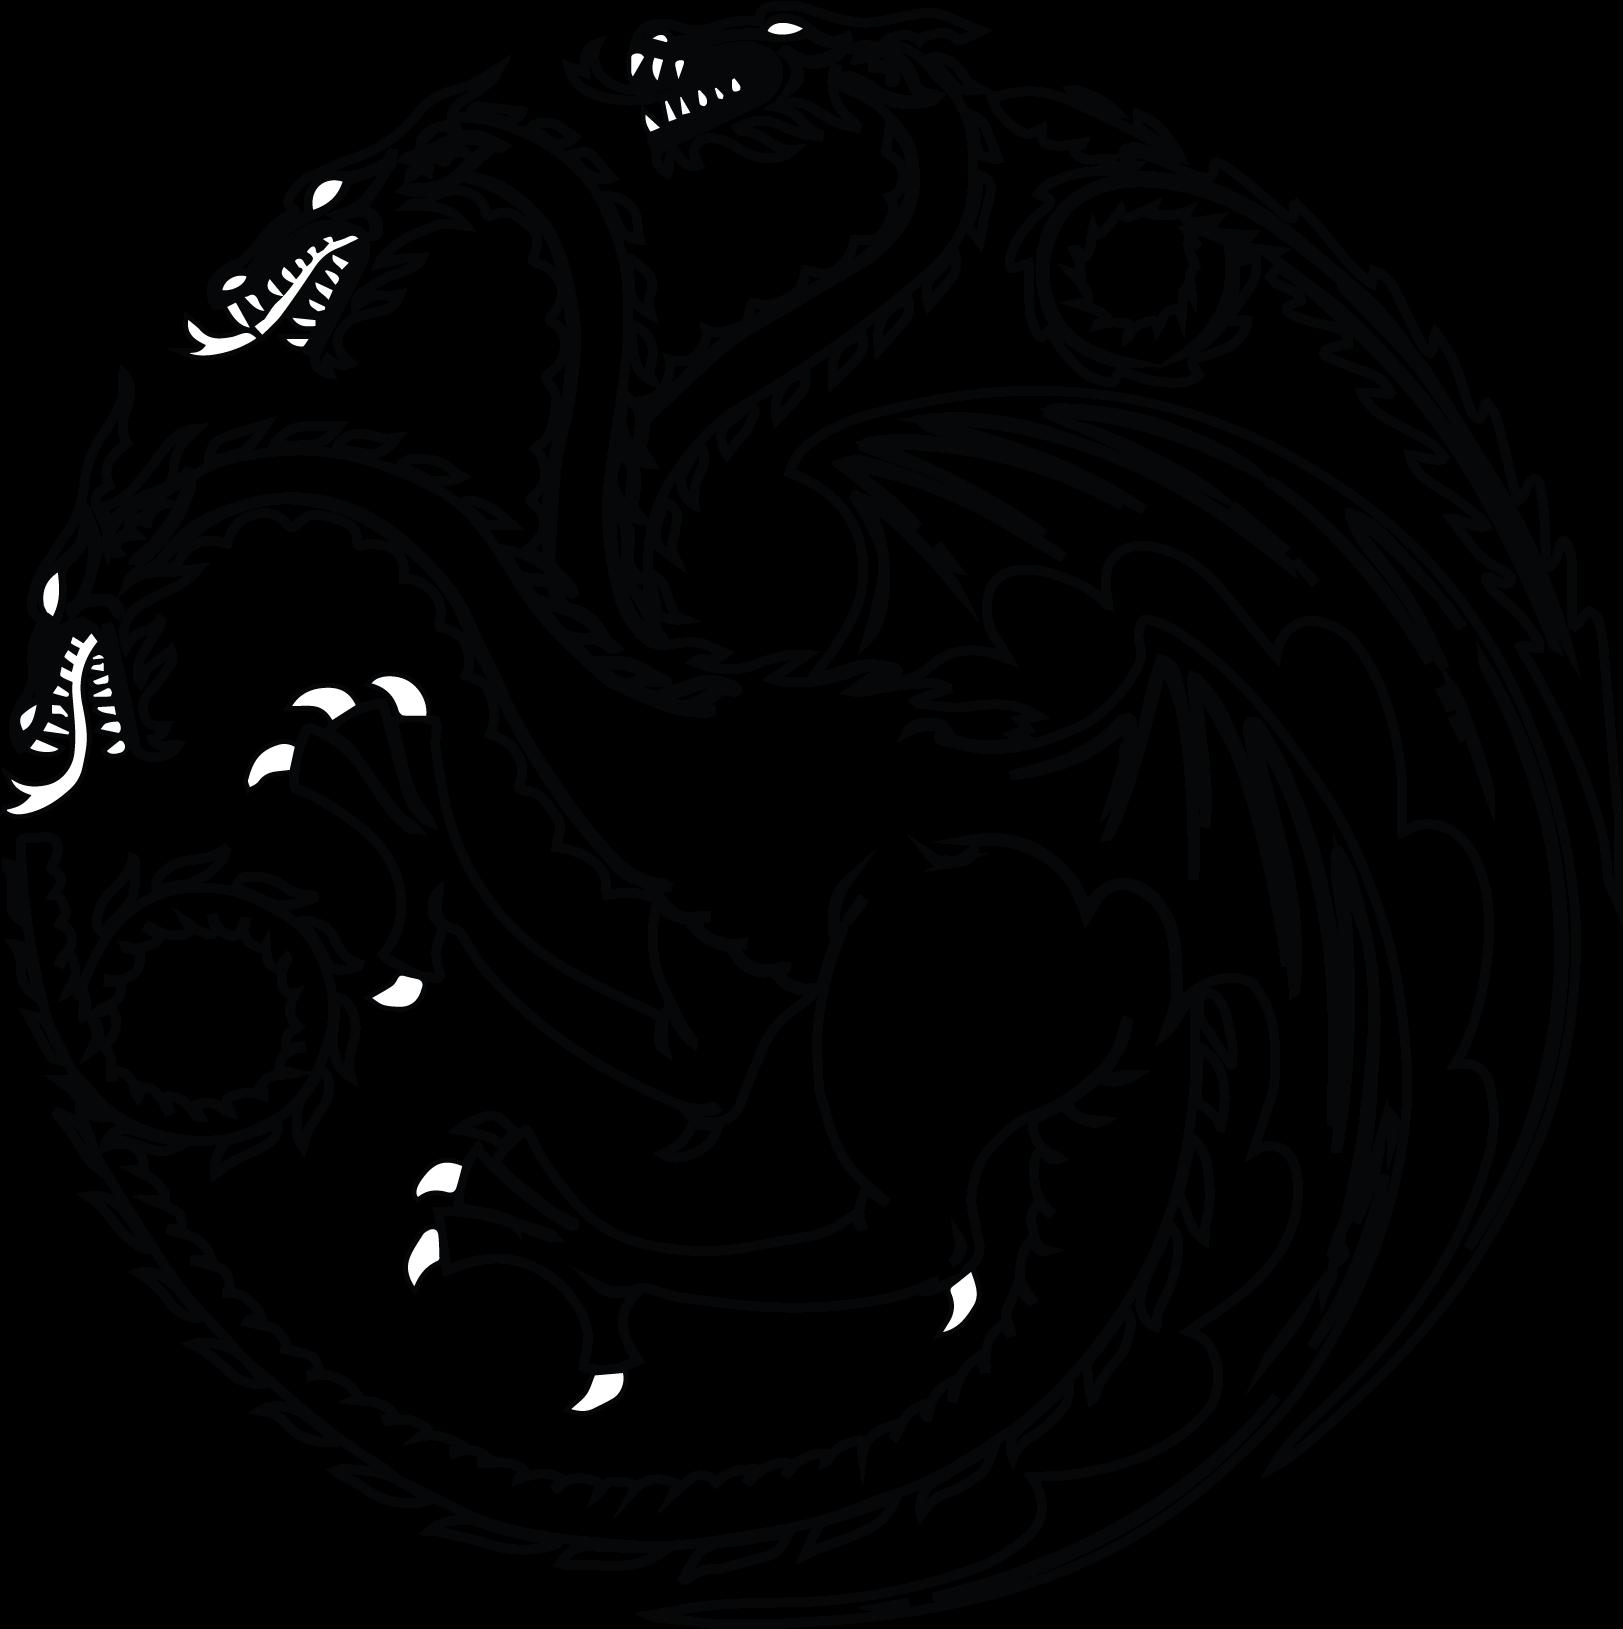 Open Full Size Black And White House Targaryen Sigil Download Transparent Png Image And Share Seekpng Wi House Targaryen Sigil Targaryen Sigil House Targaryen